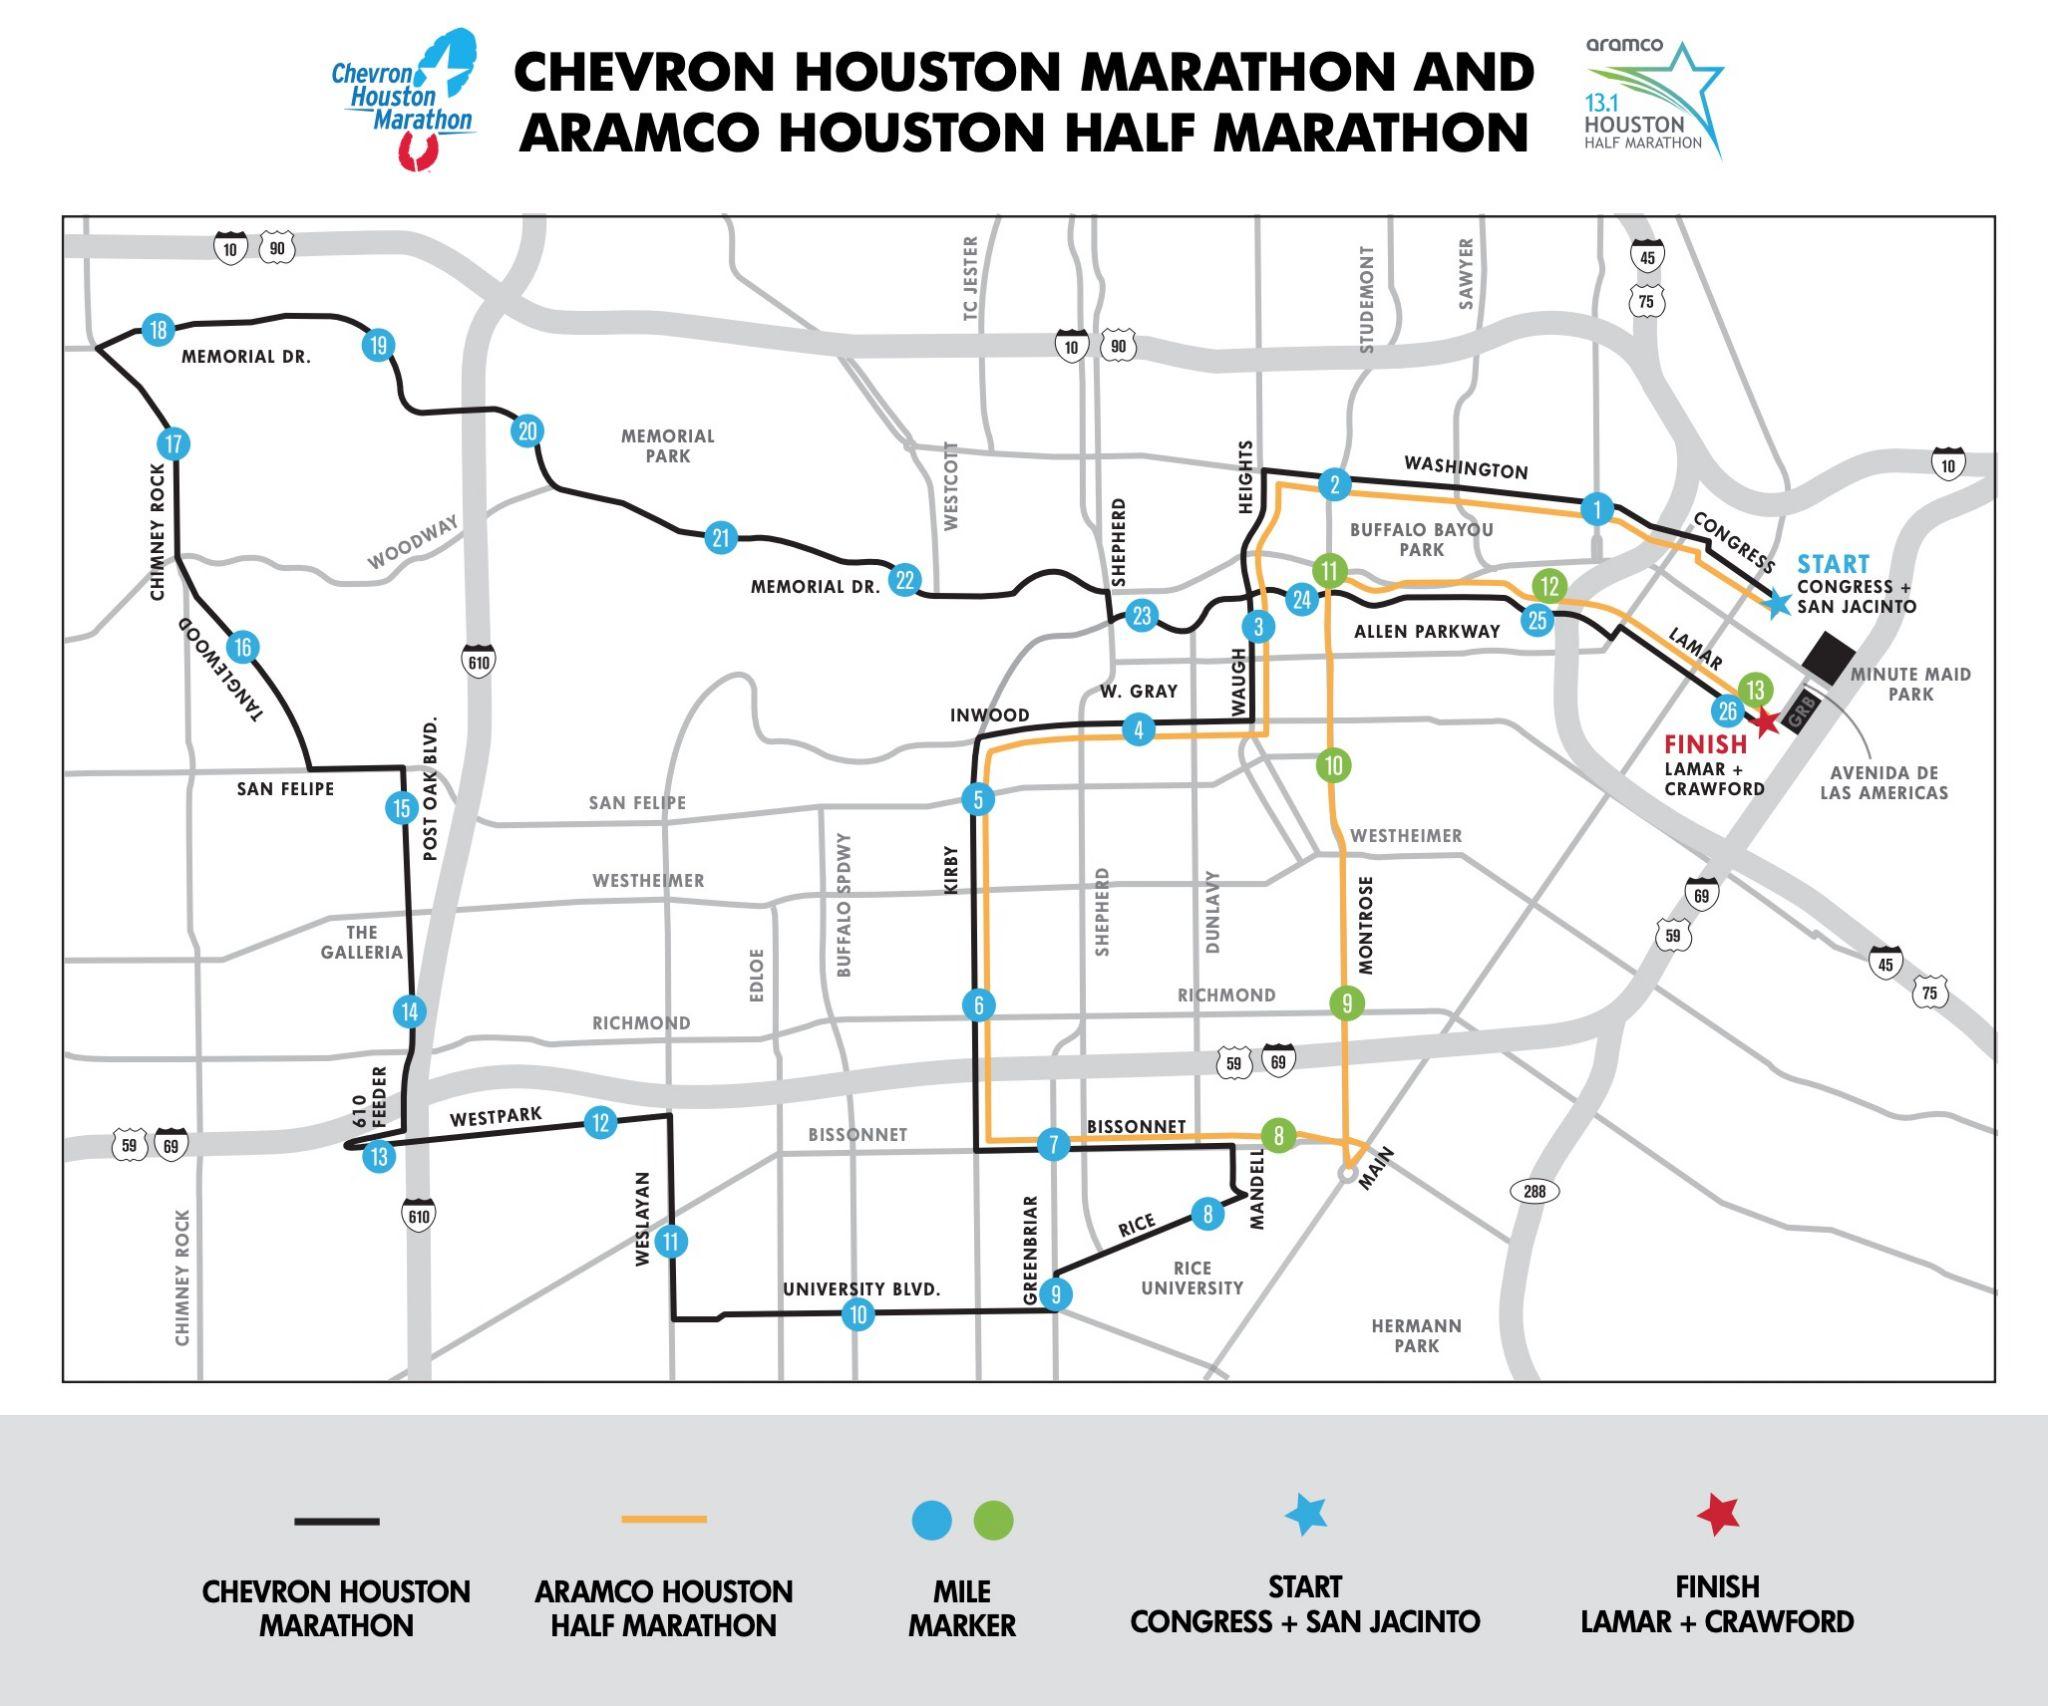 2019 Chevron Houston Marathon: Street closures